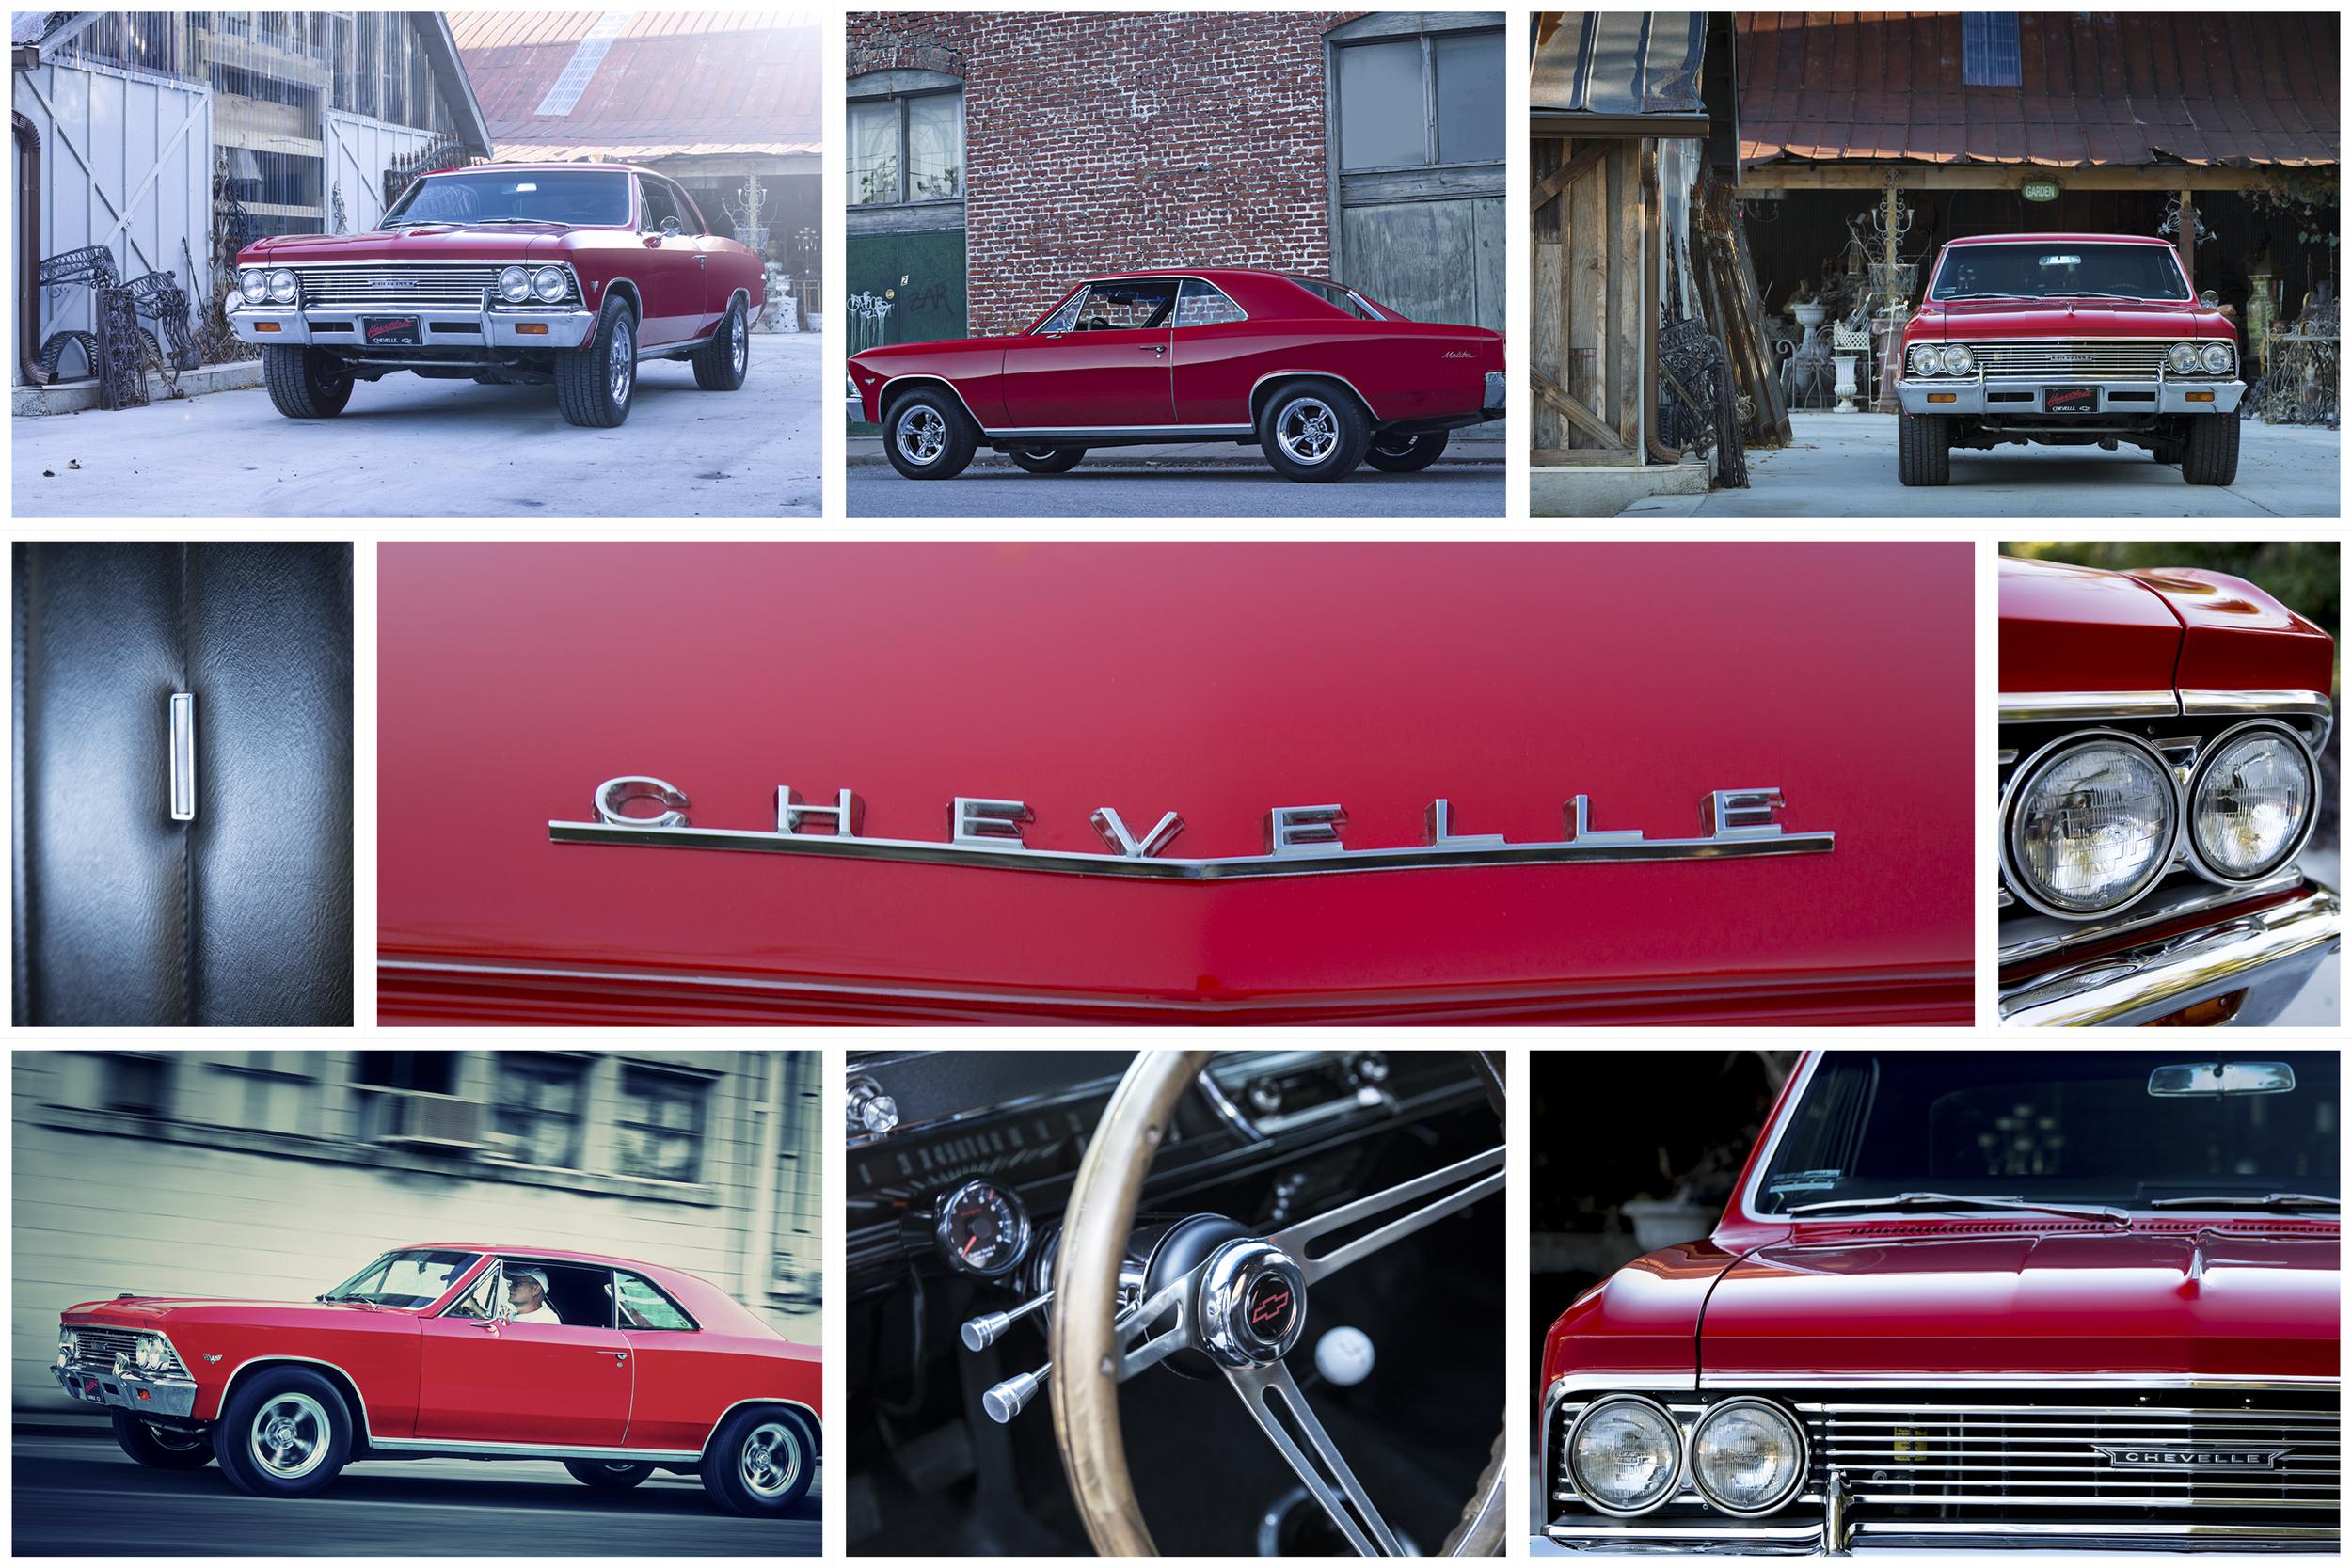 Automotive Photographer John Murphy 66 Chevelle Collage